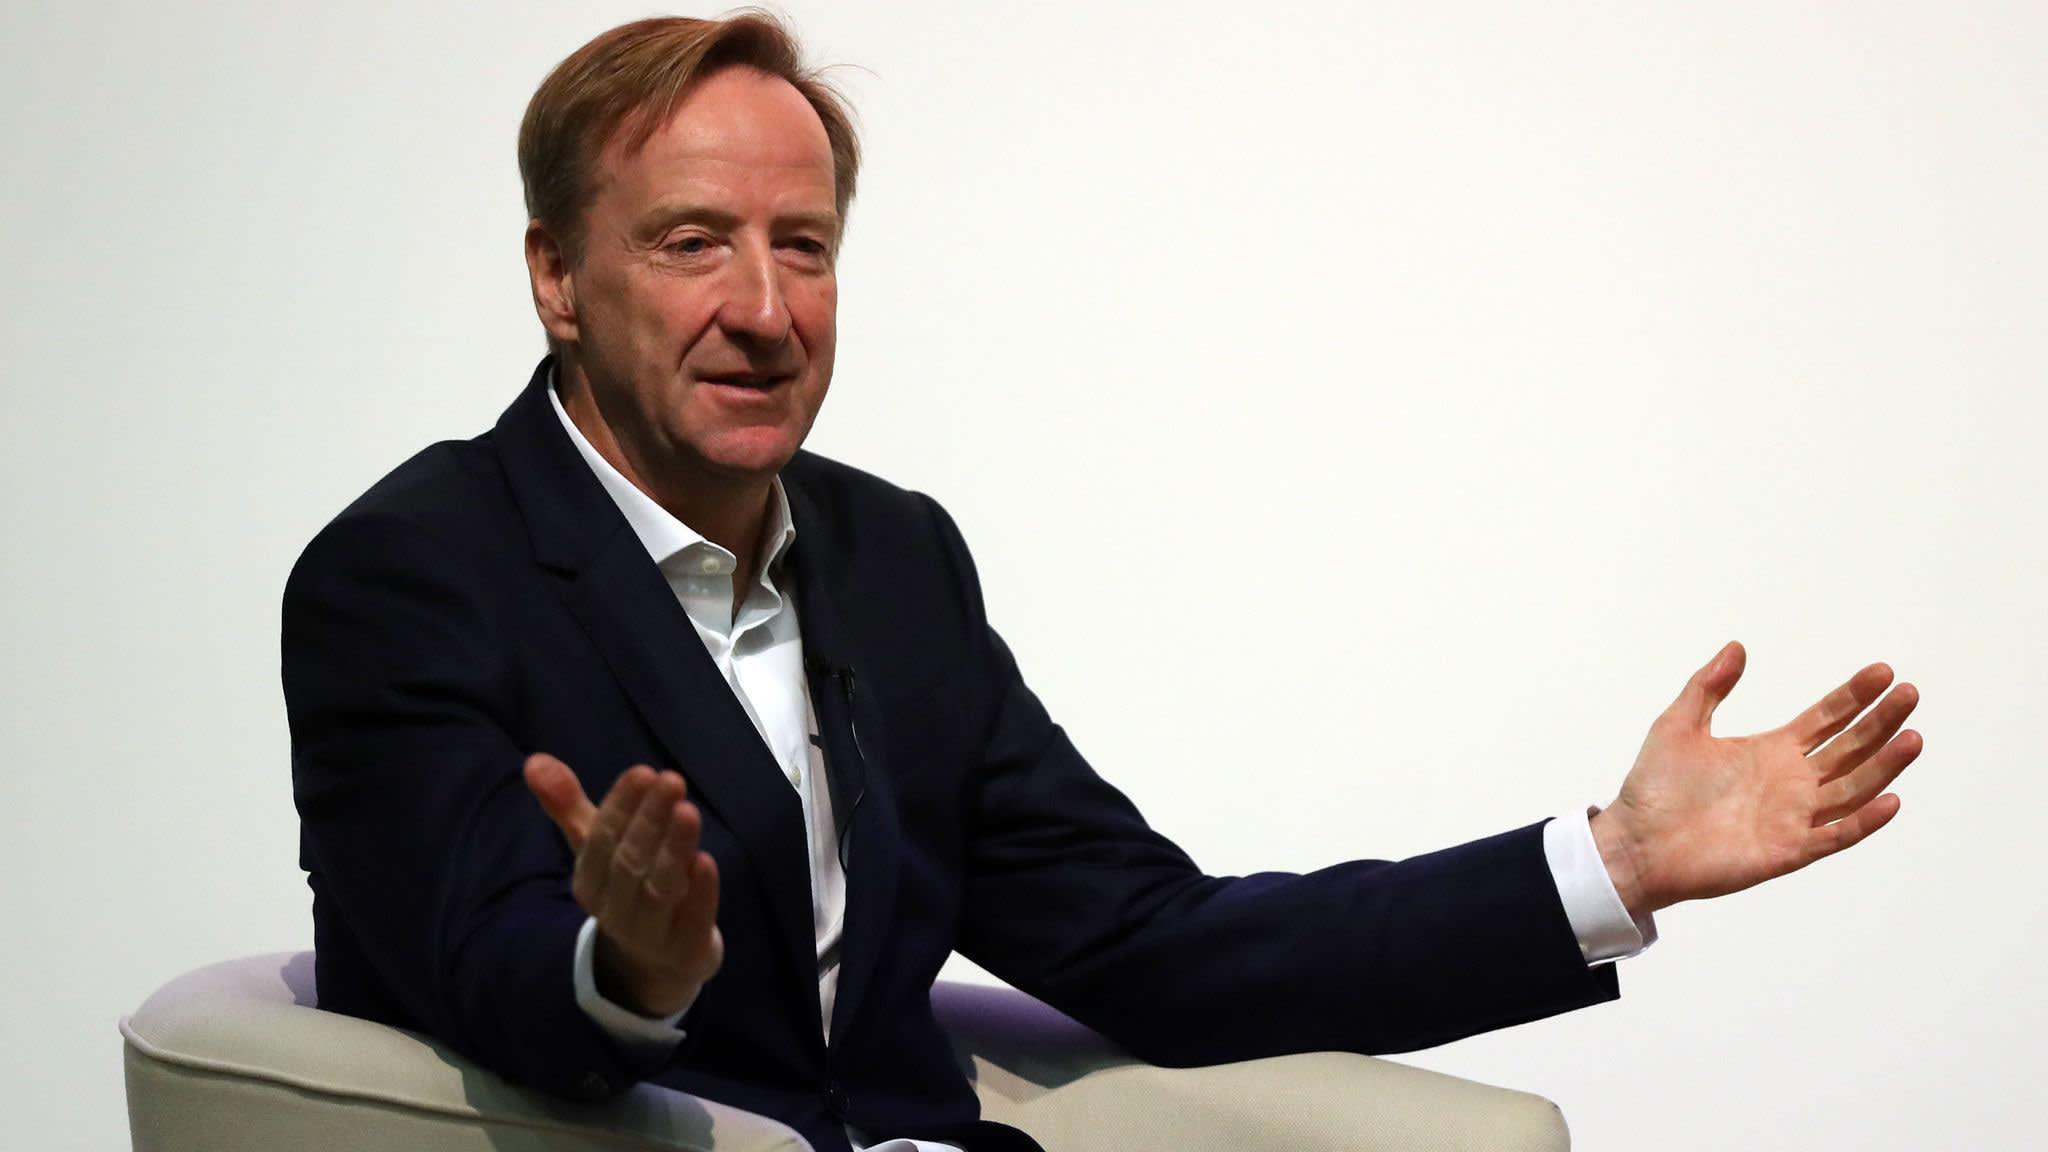 Head of MI6 warns of Huawei security concerns